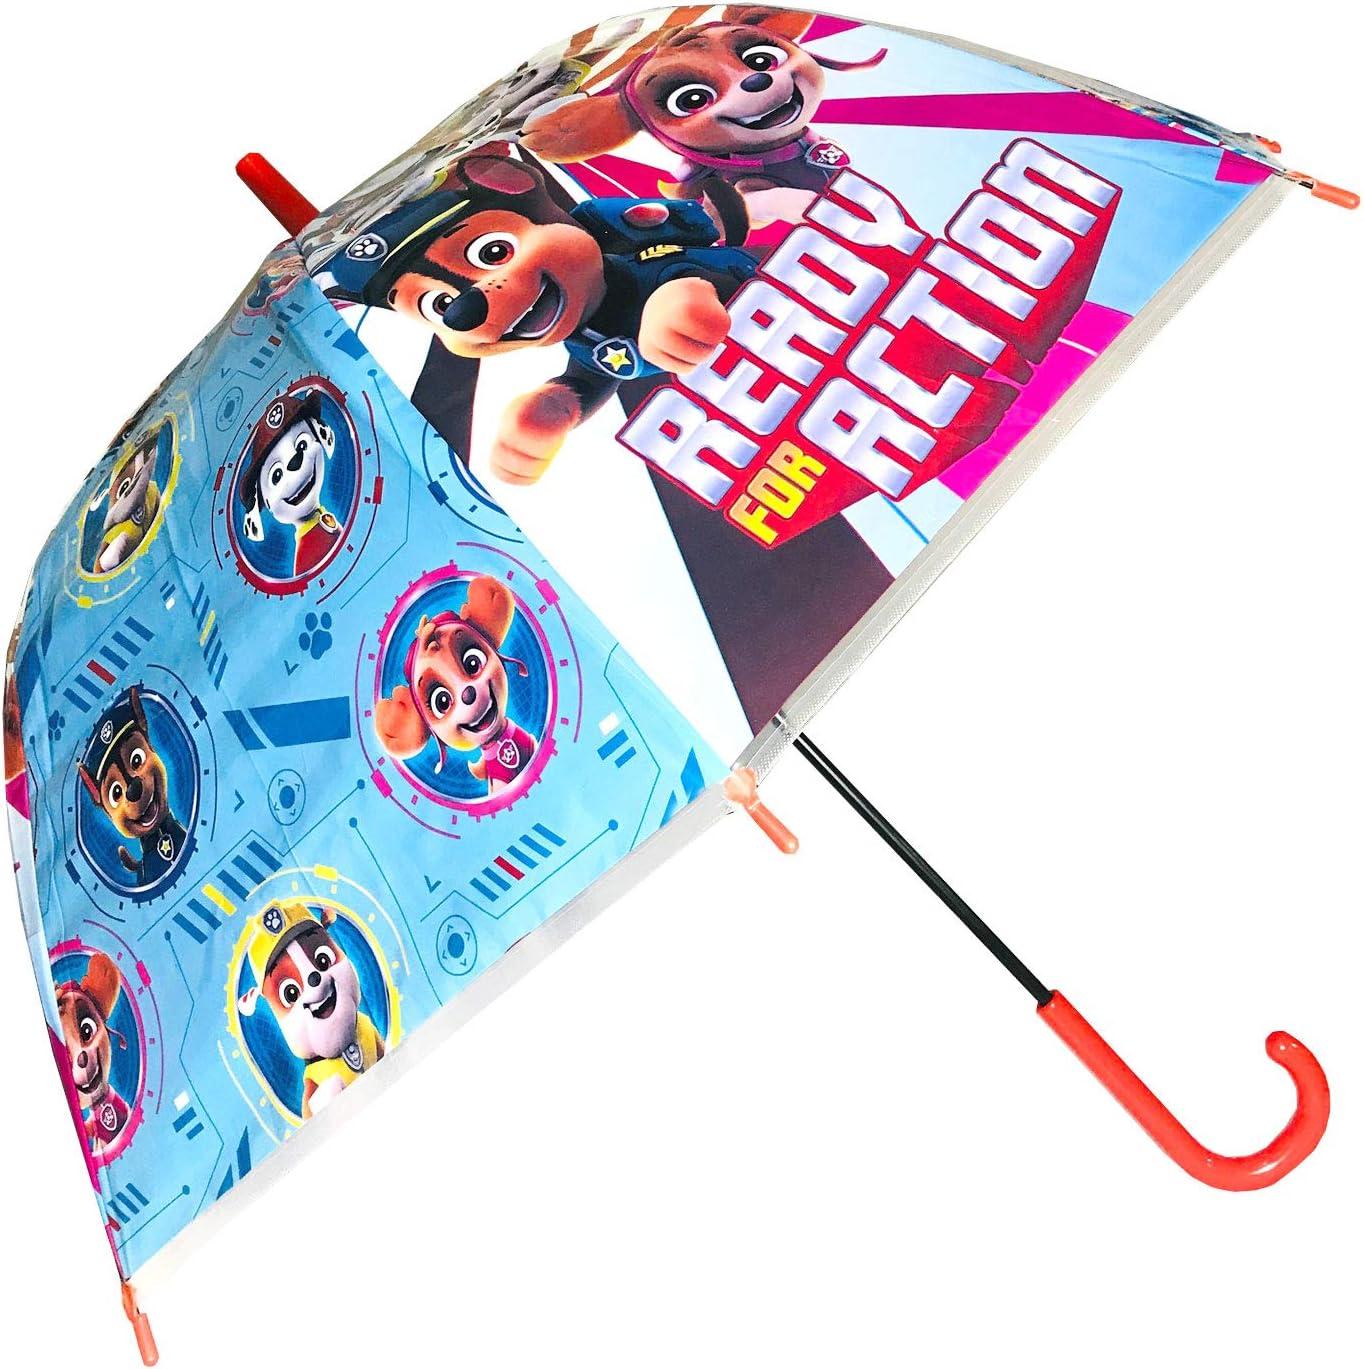 Paw Patrol Umbrella Automatic Dome Children 45 cm